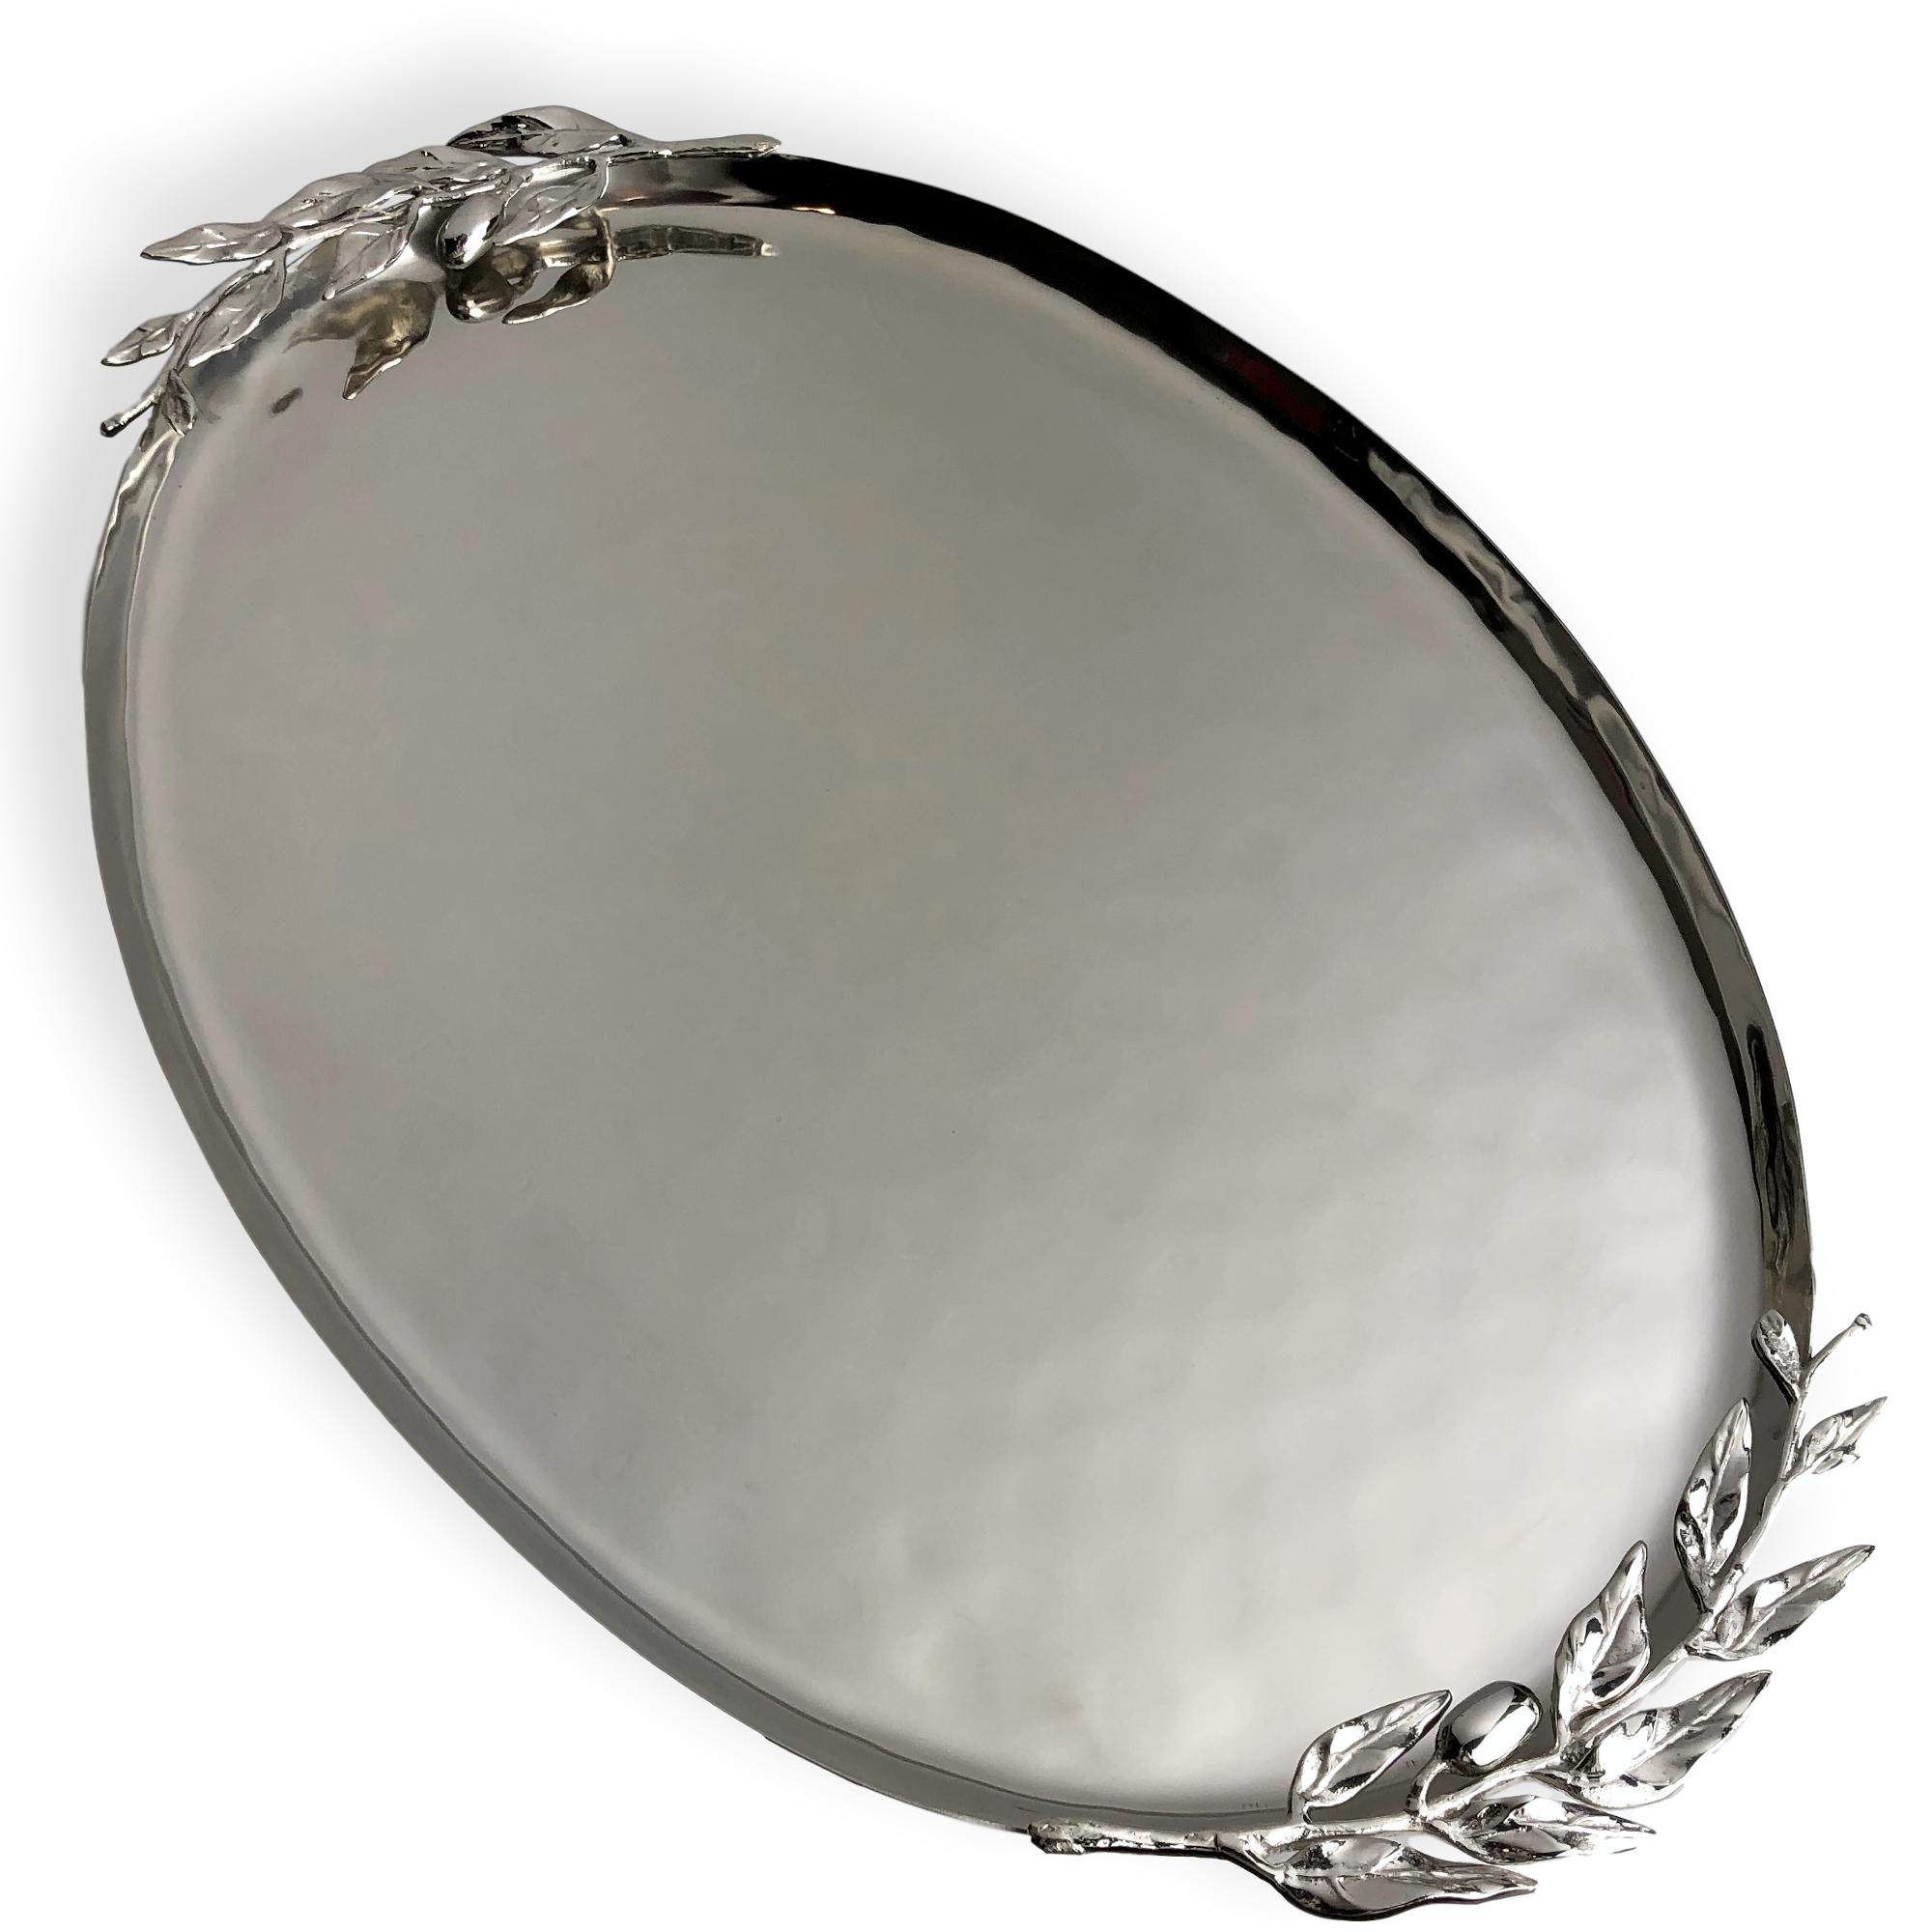 Carmel Ceramica Oliveira 23 x 15 Inch Centerpiece Tray